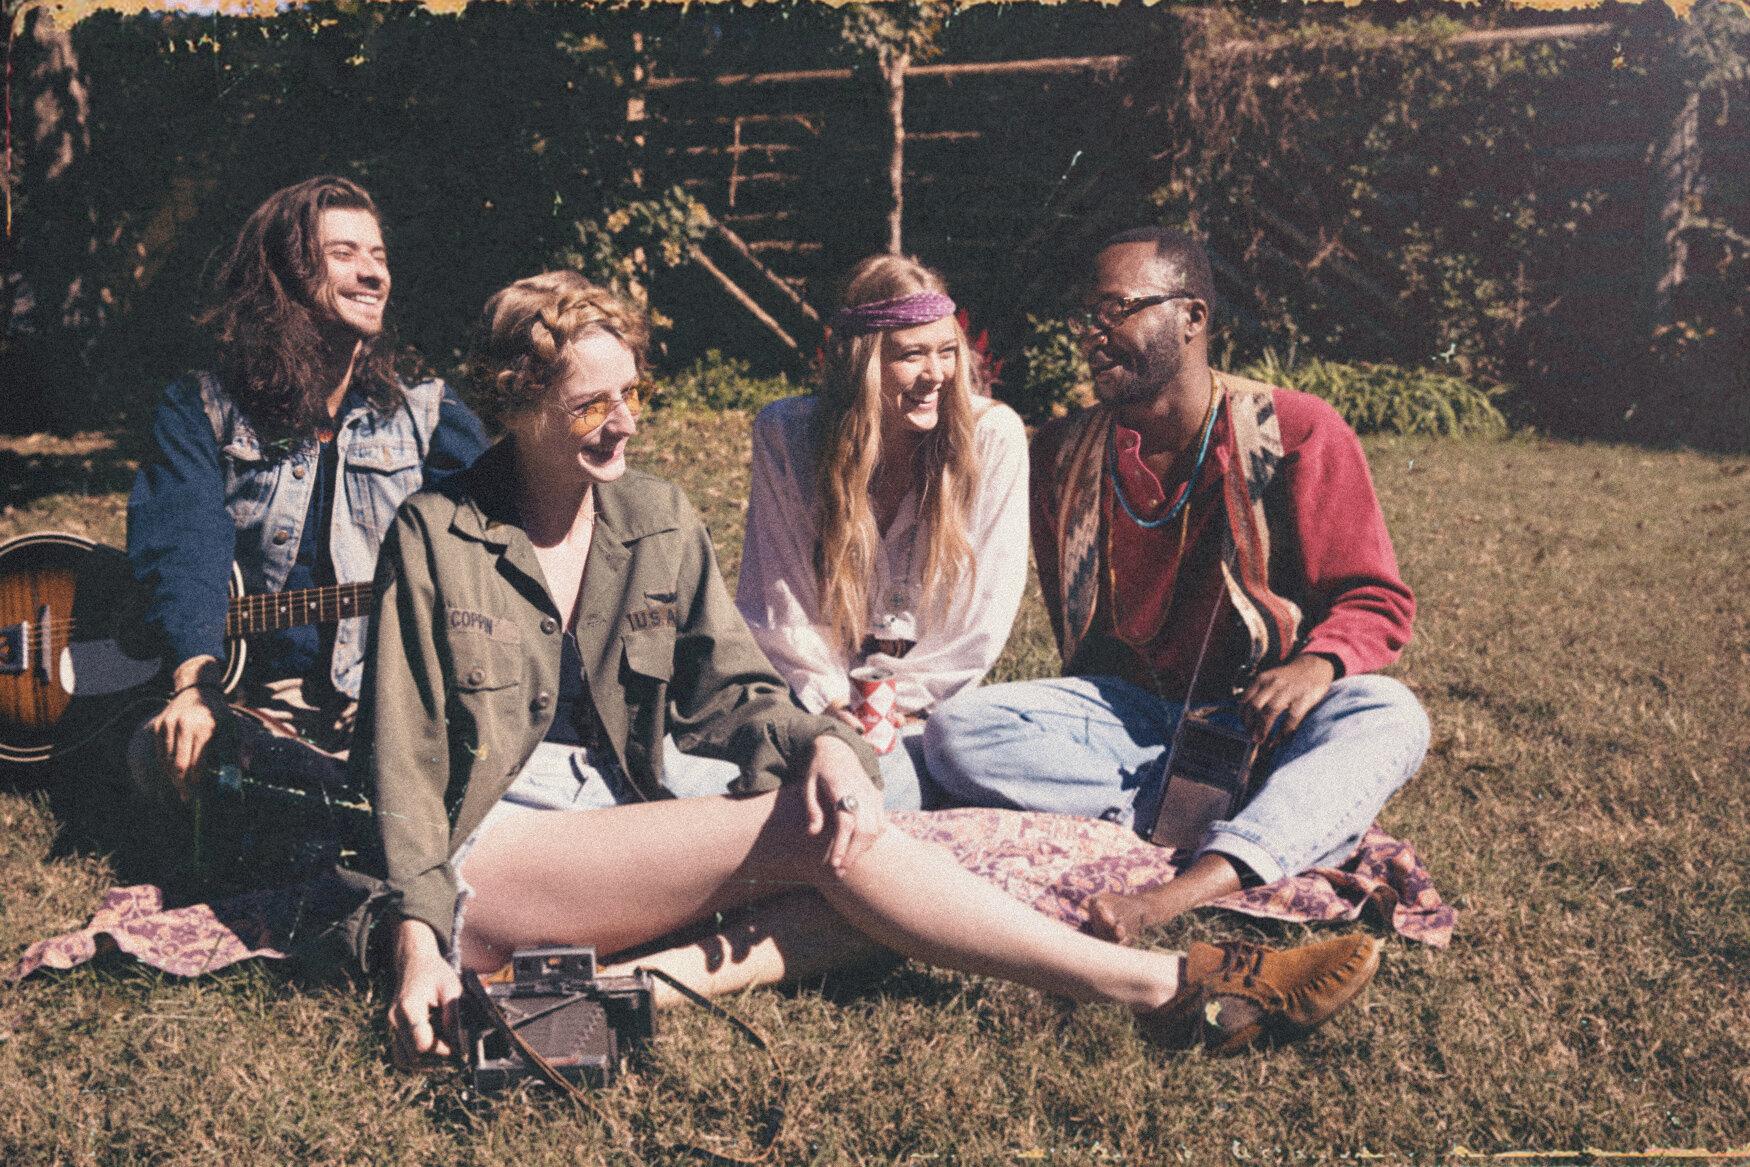 1960s-youth-lifestyle-3.jpg